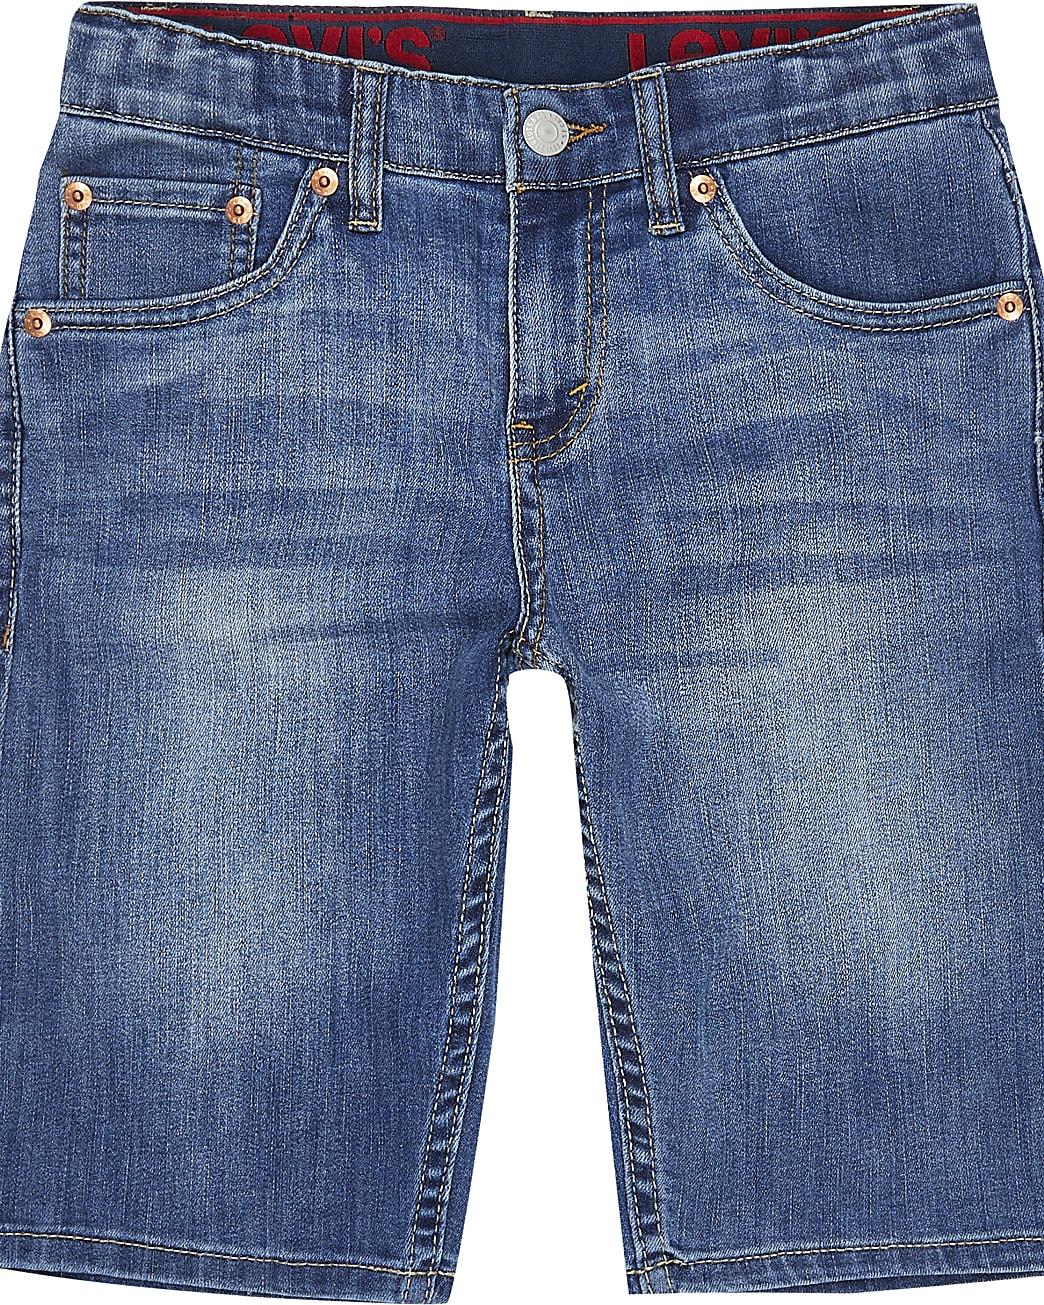 Boys blue Levi's denim shorts